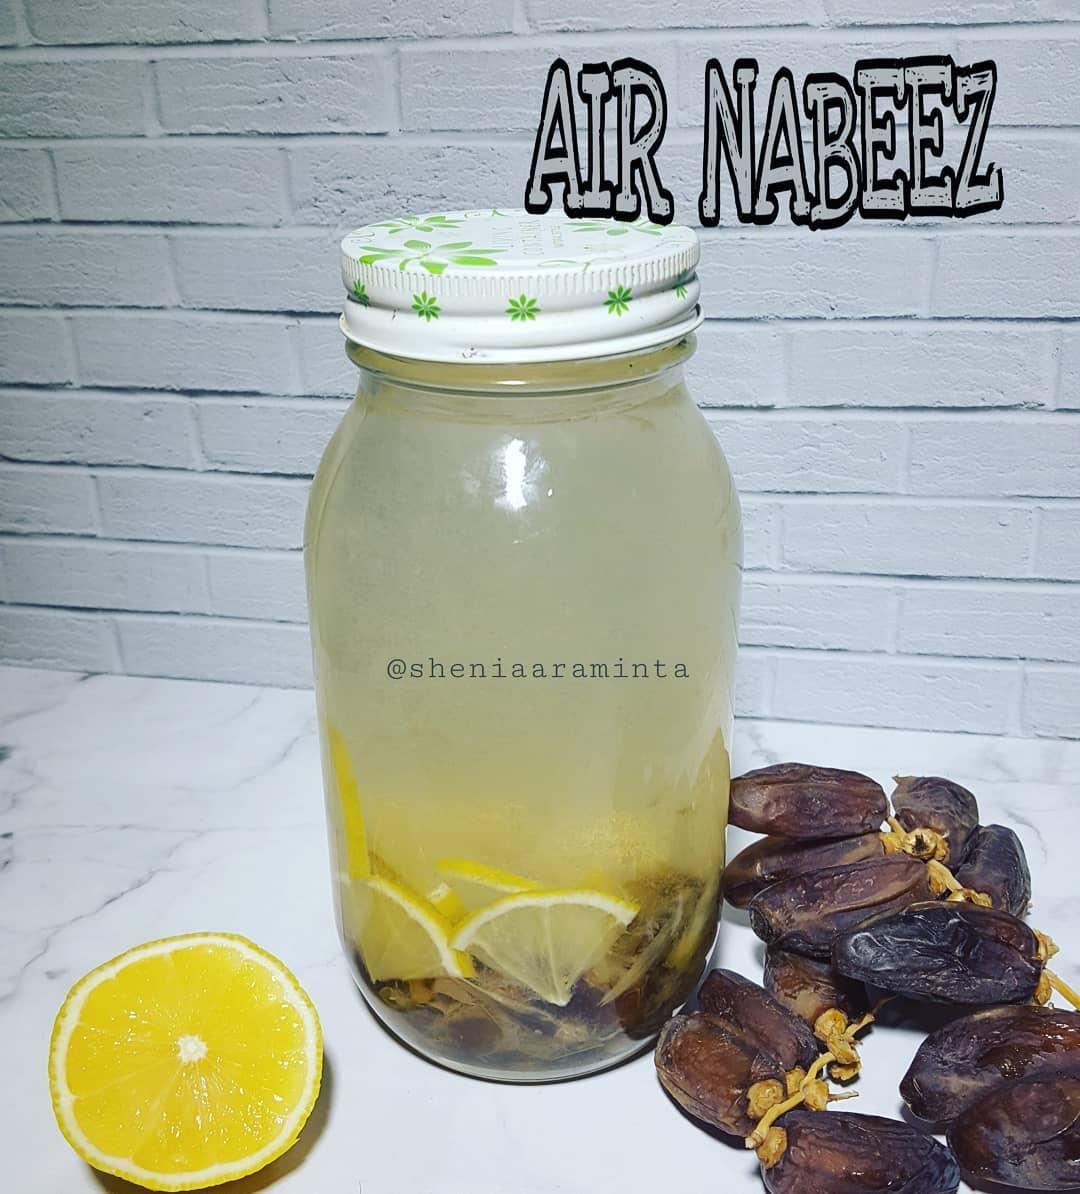 Resep Air Nabeez